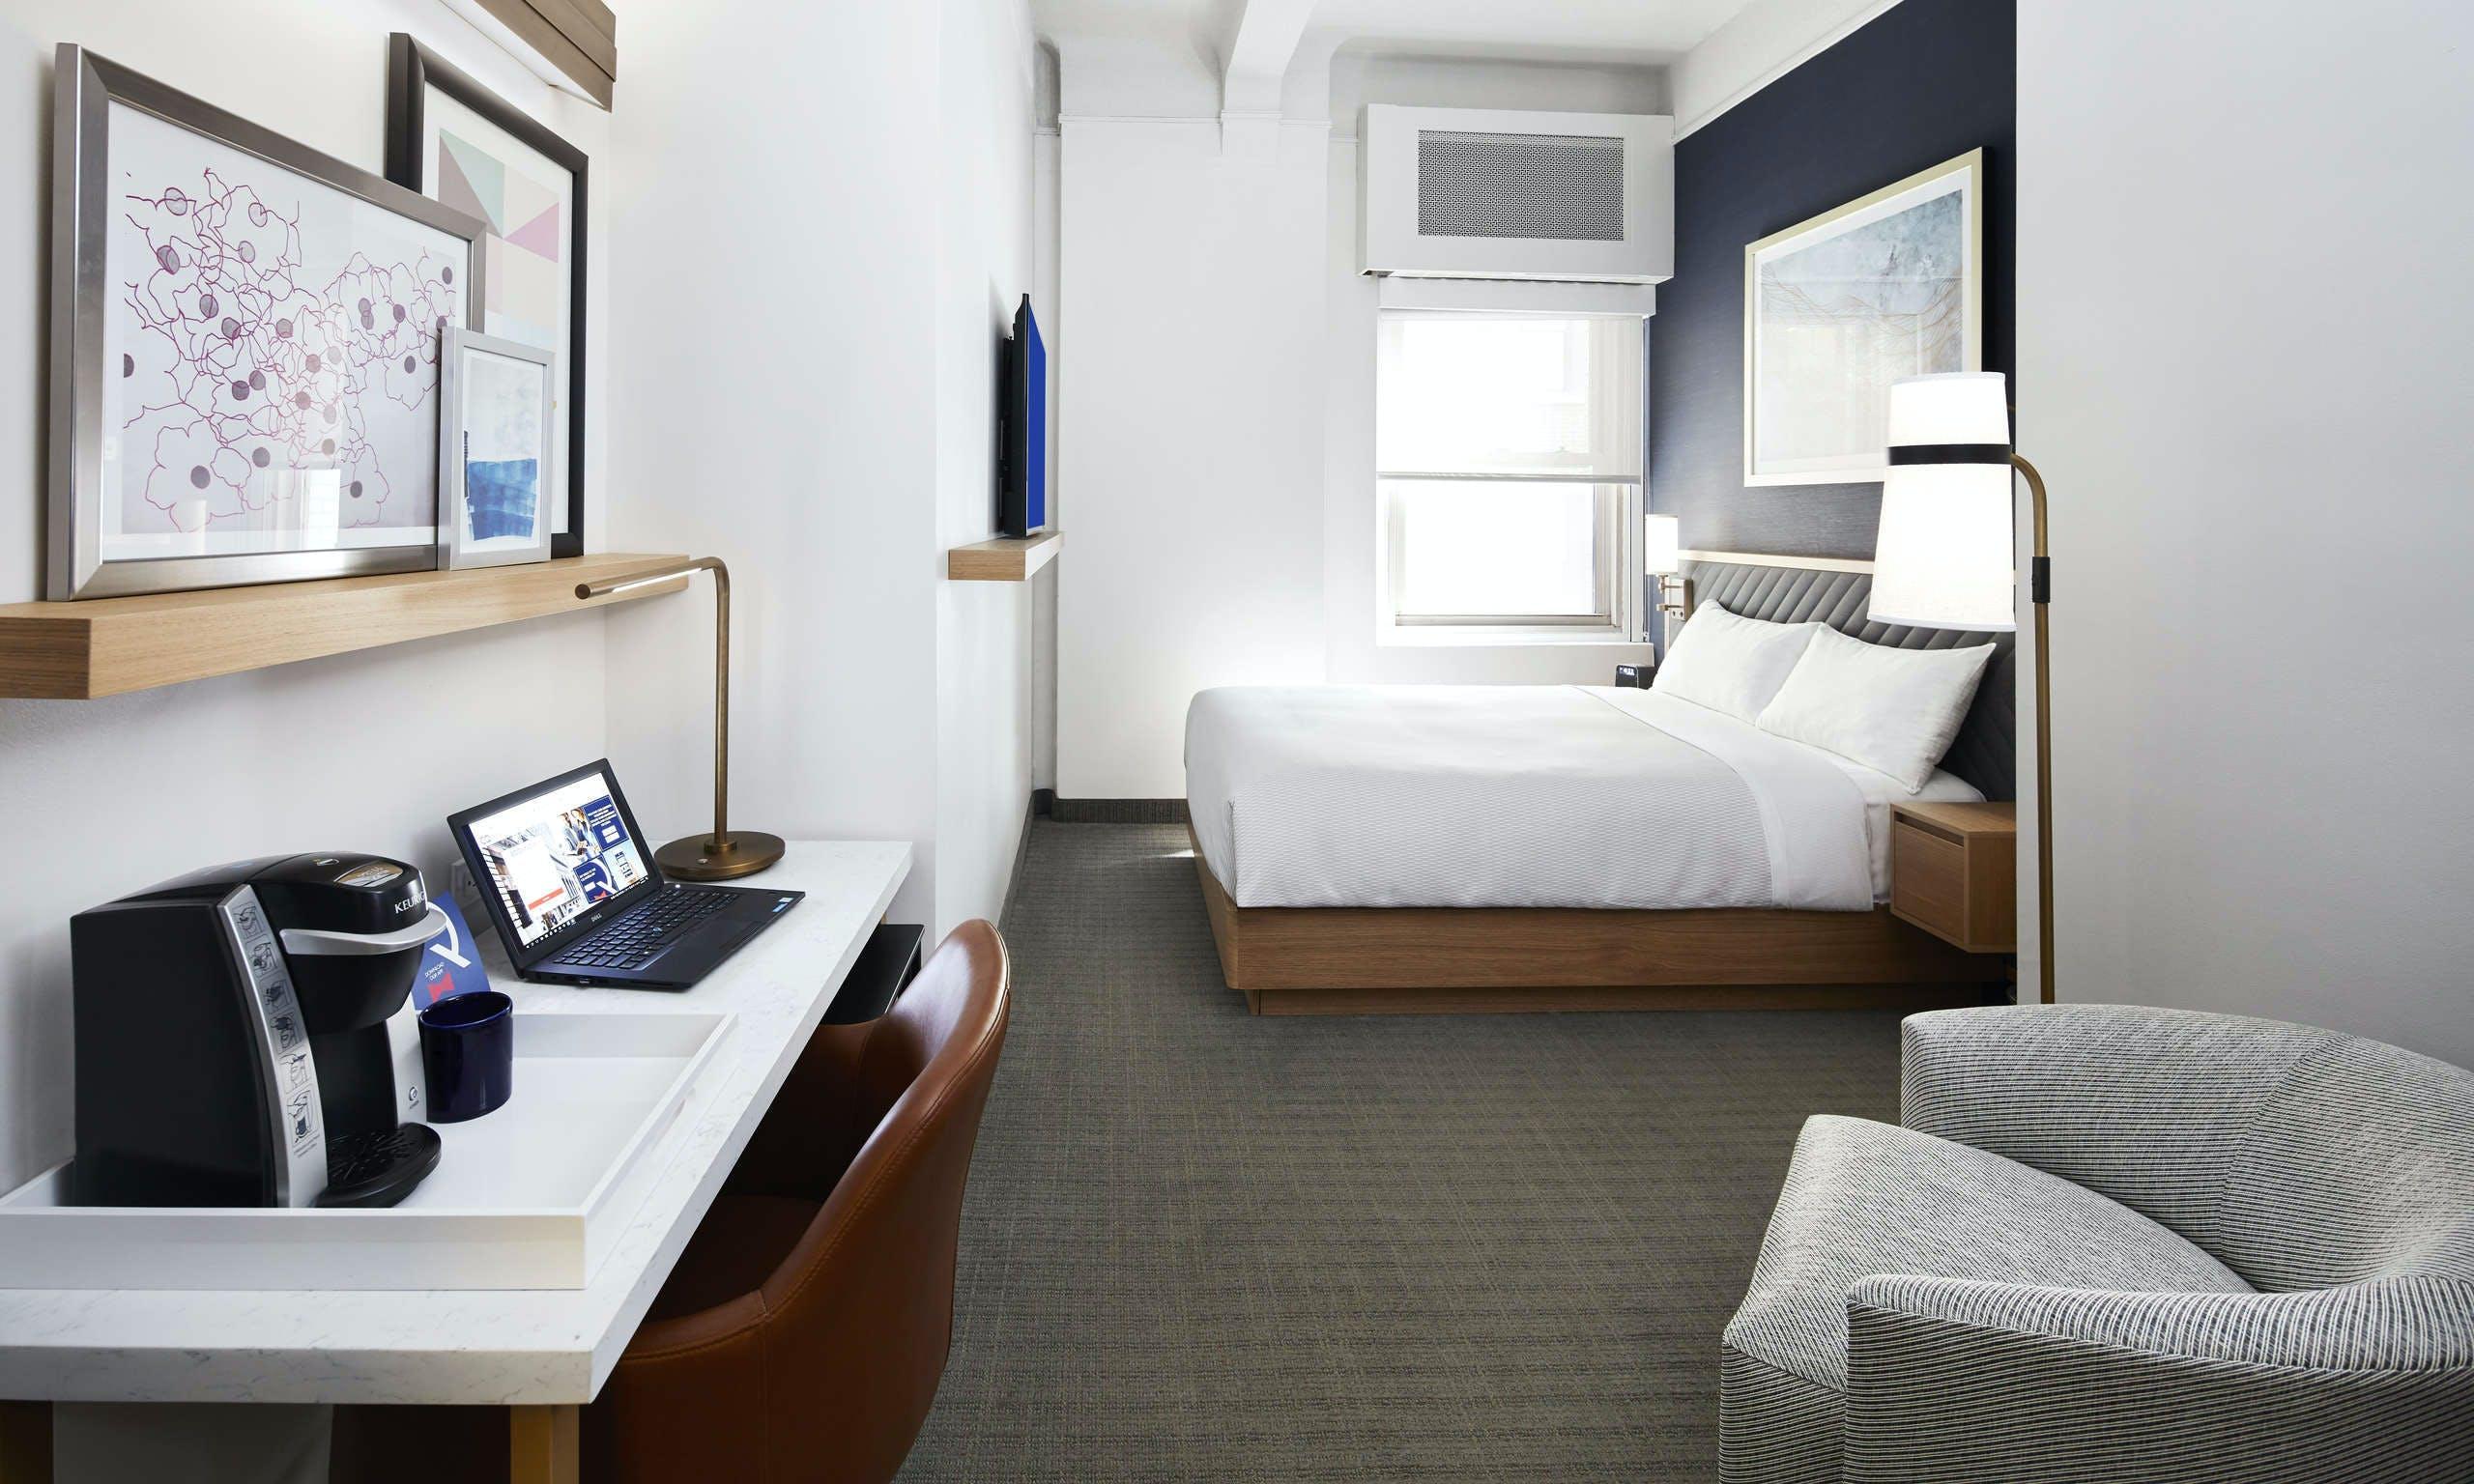 Club Quarters Hotel, Wall Street